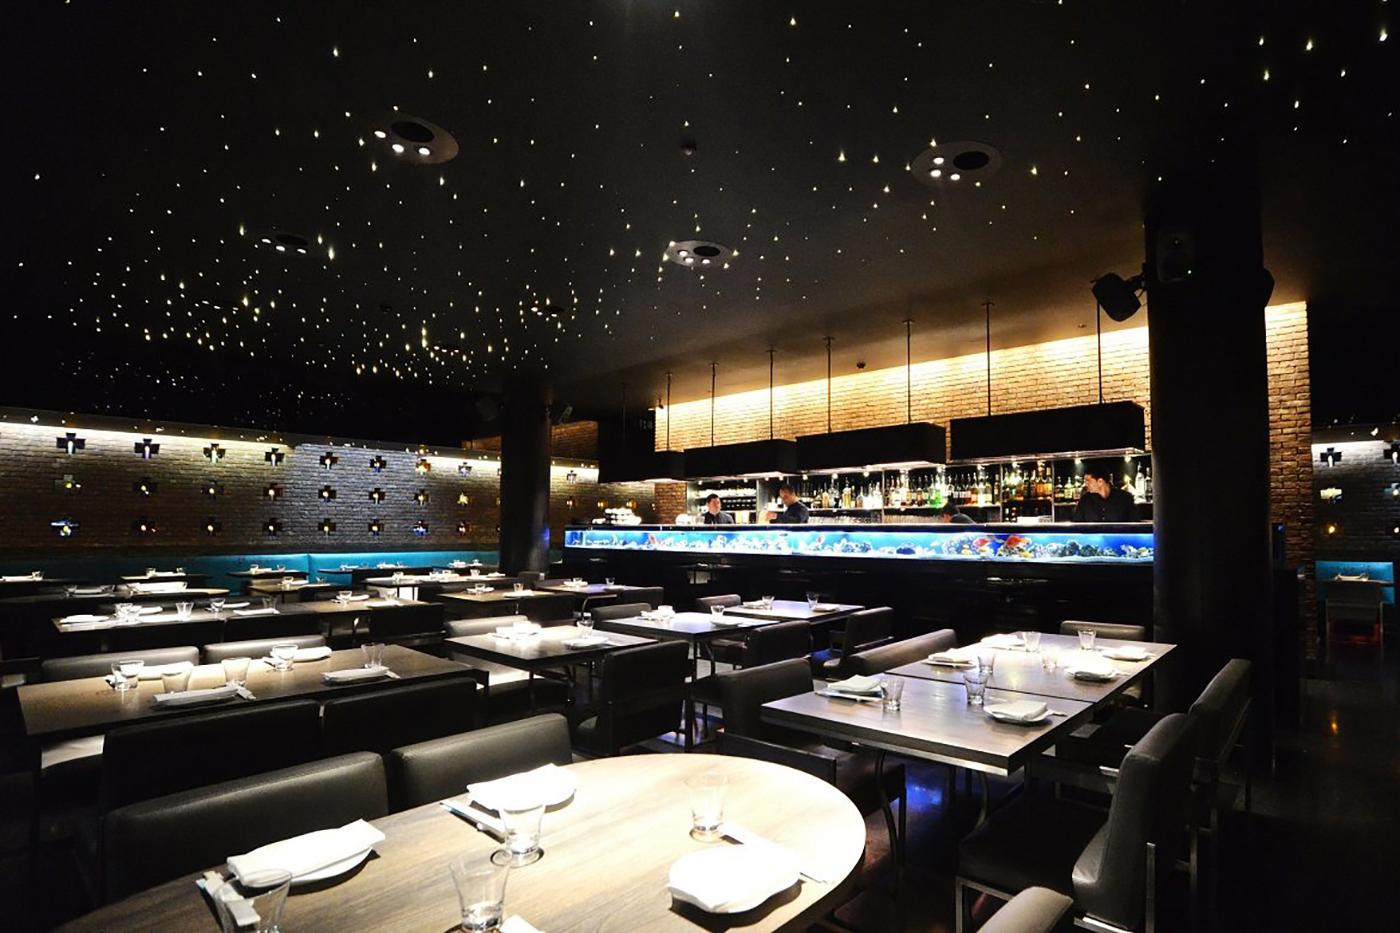 my-wanderlustnotes-i-3-migliori-ristoranti-cinesi-di-londra-yauatcha